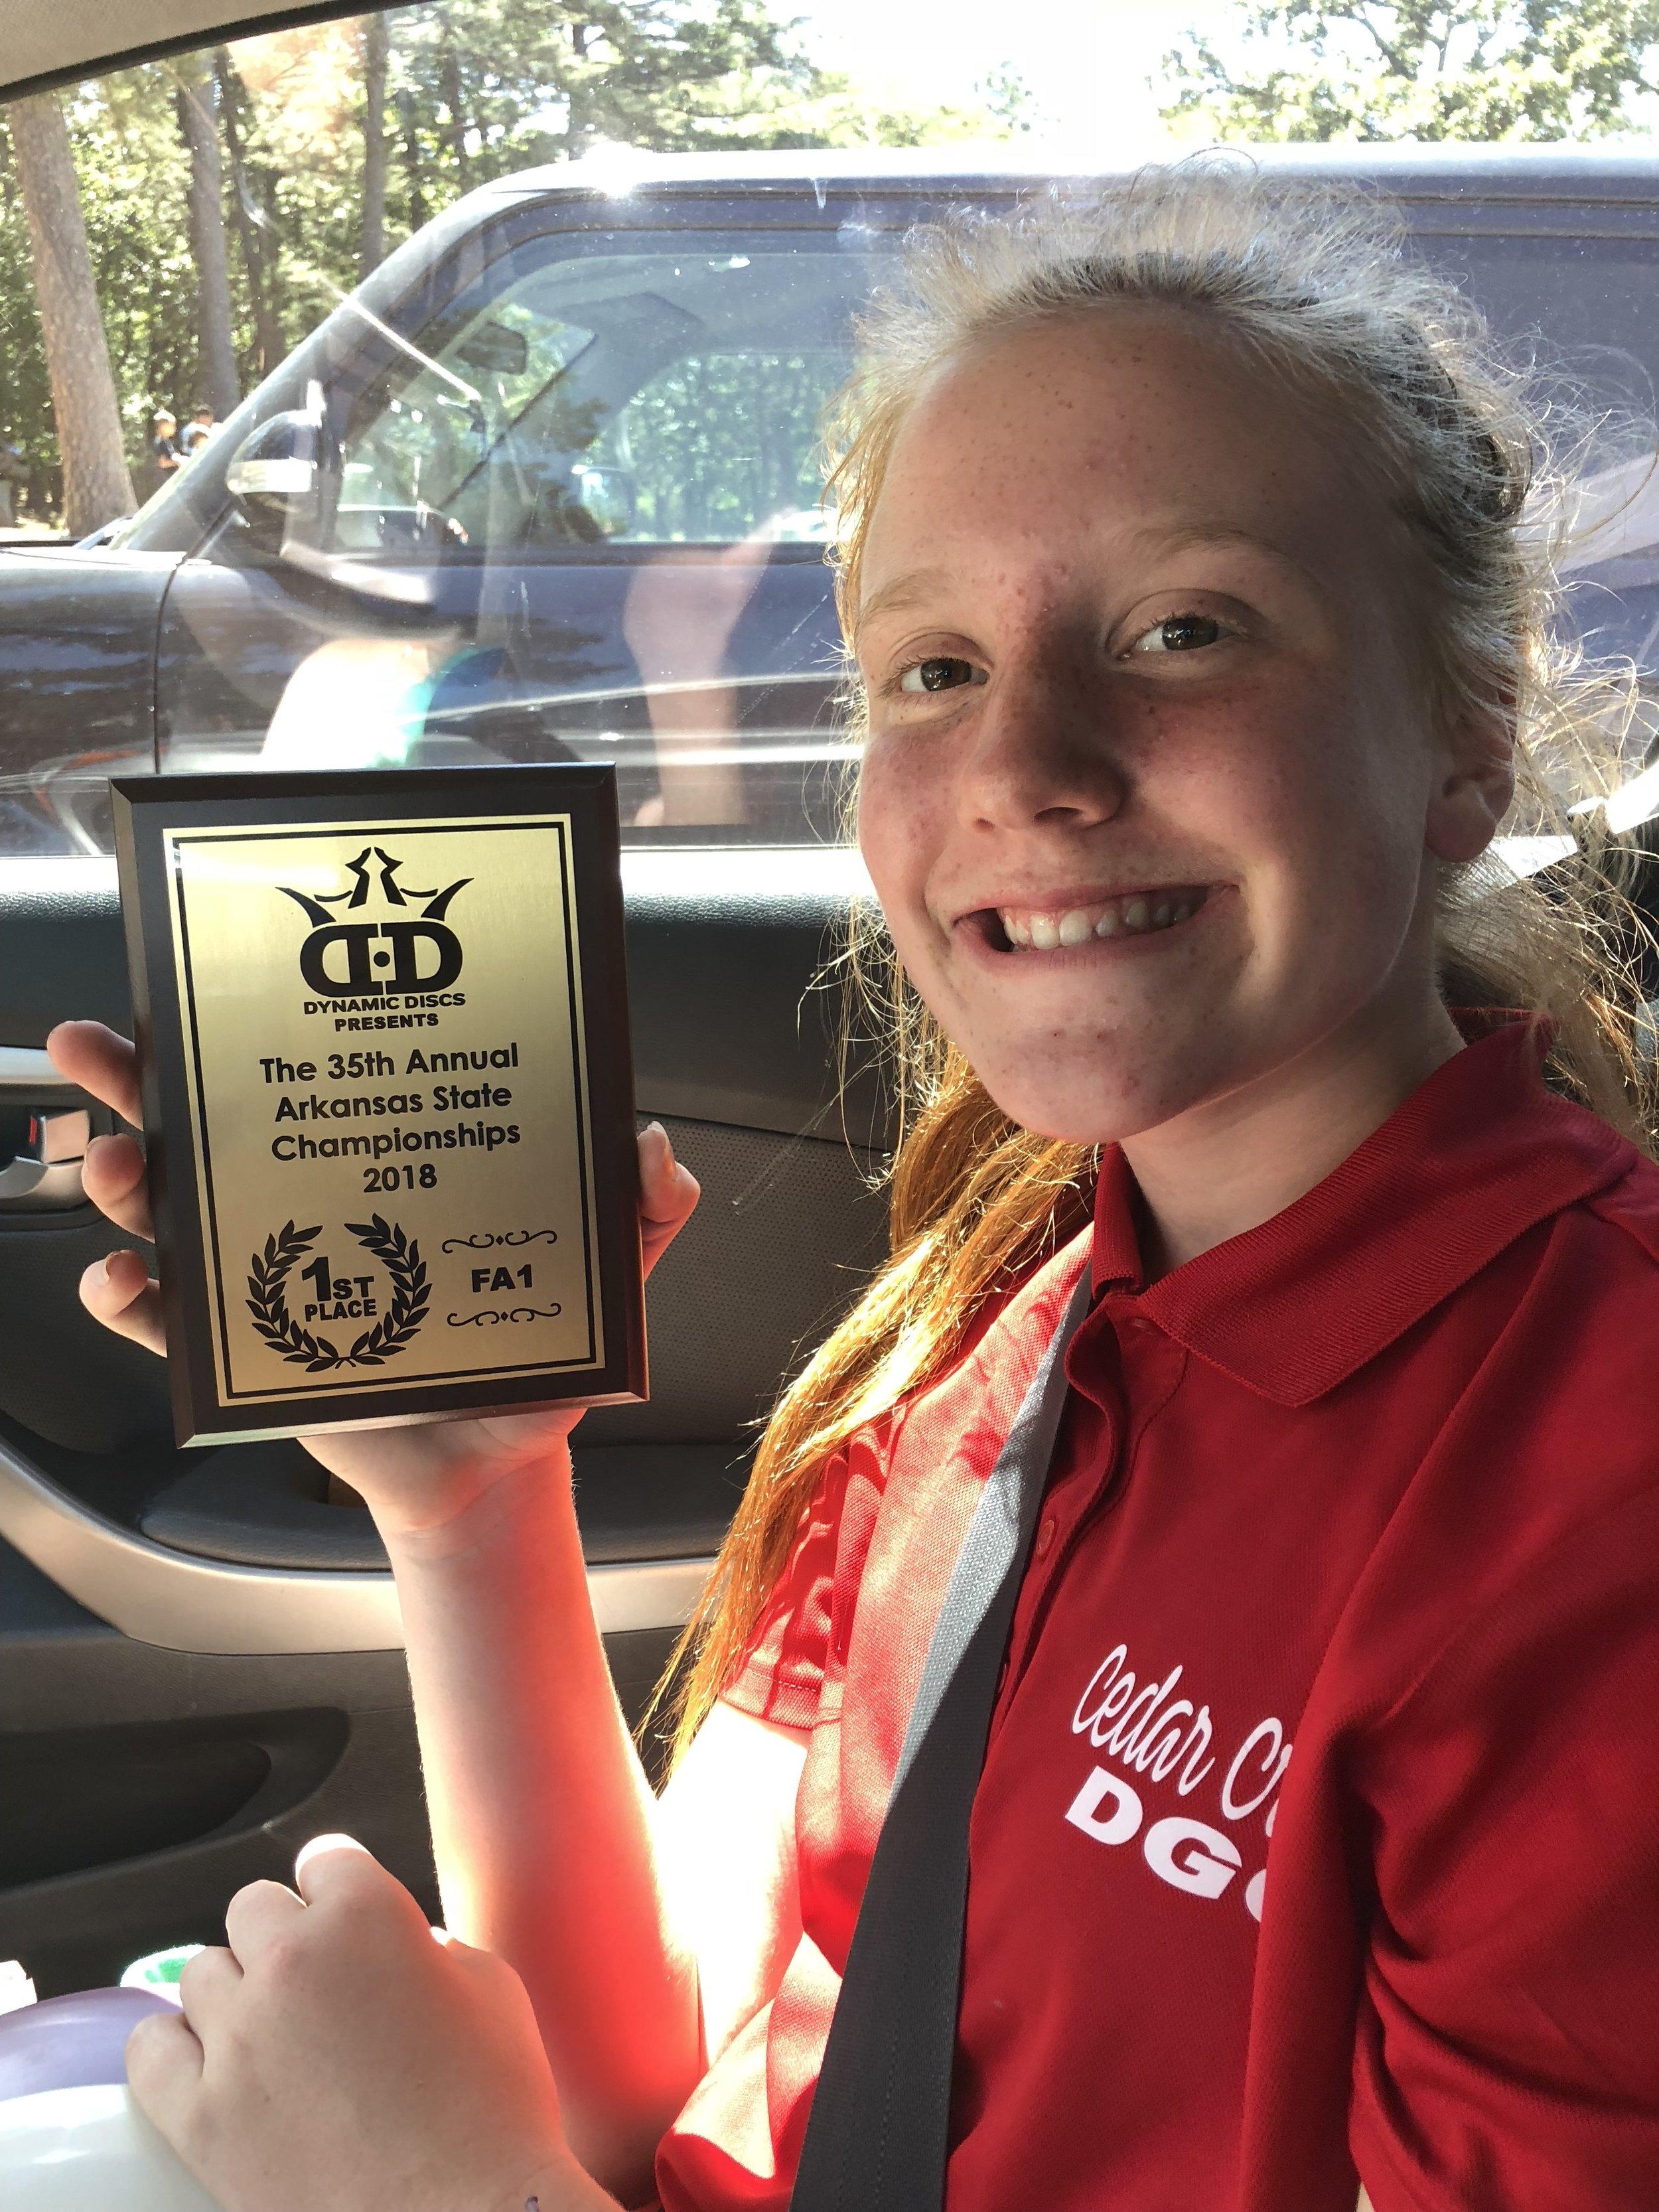 Meet your 2018 Arkansas State Women's Champion